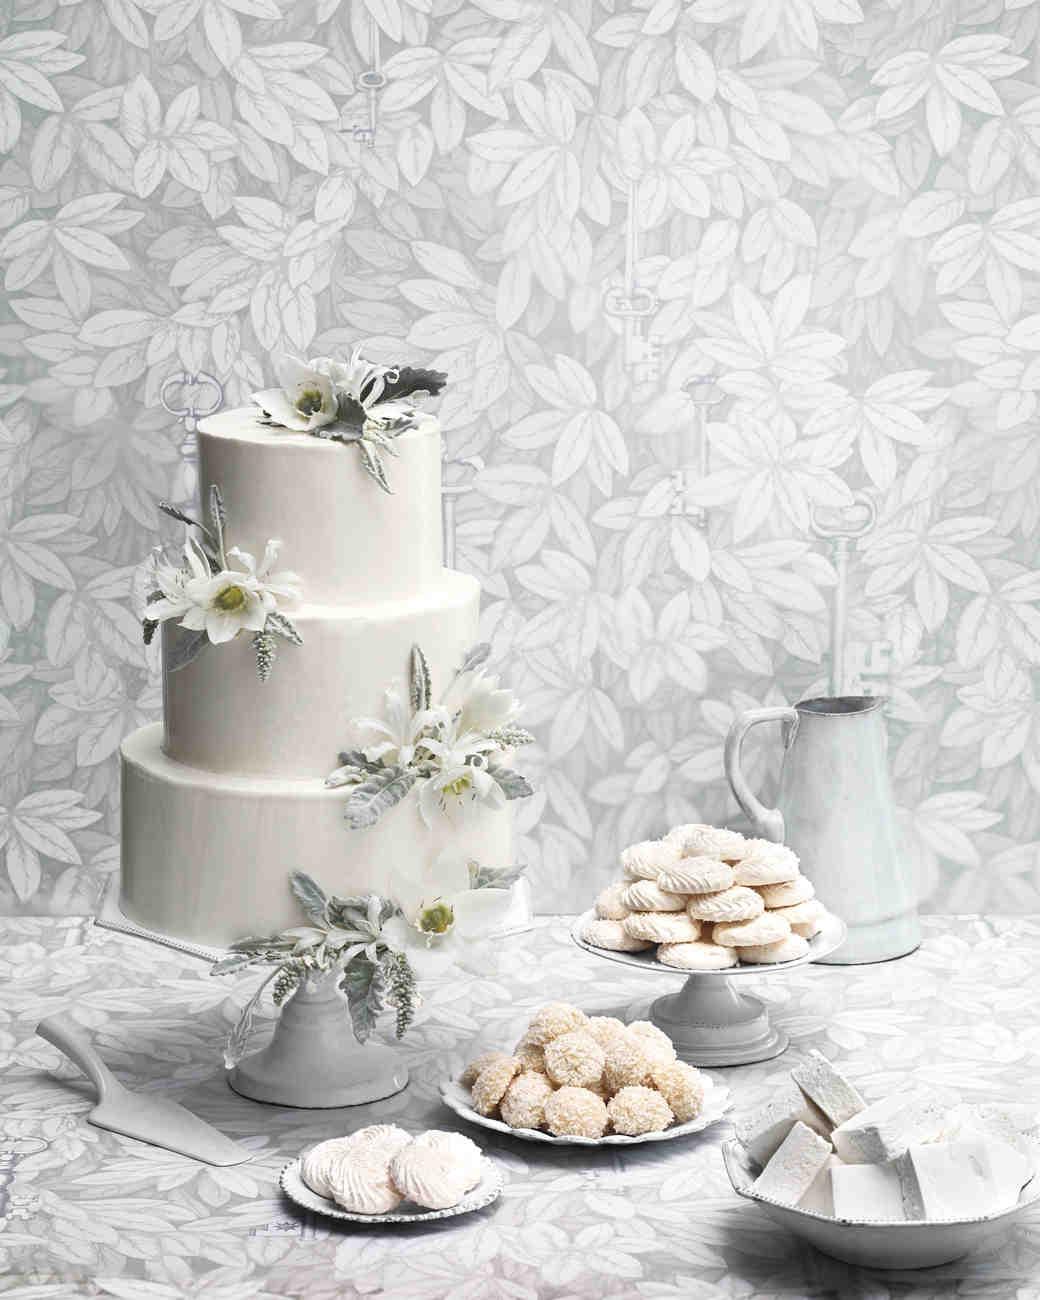 cake-8-1149-d111517.jpg